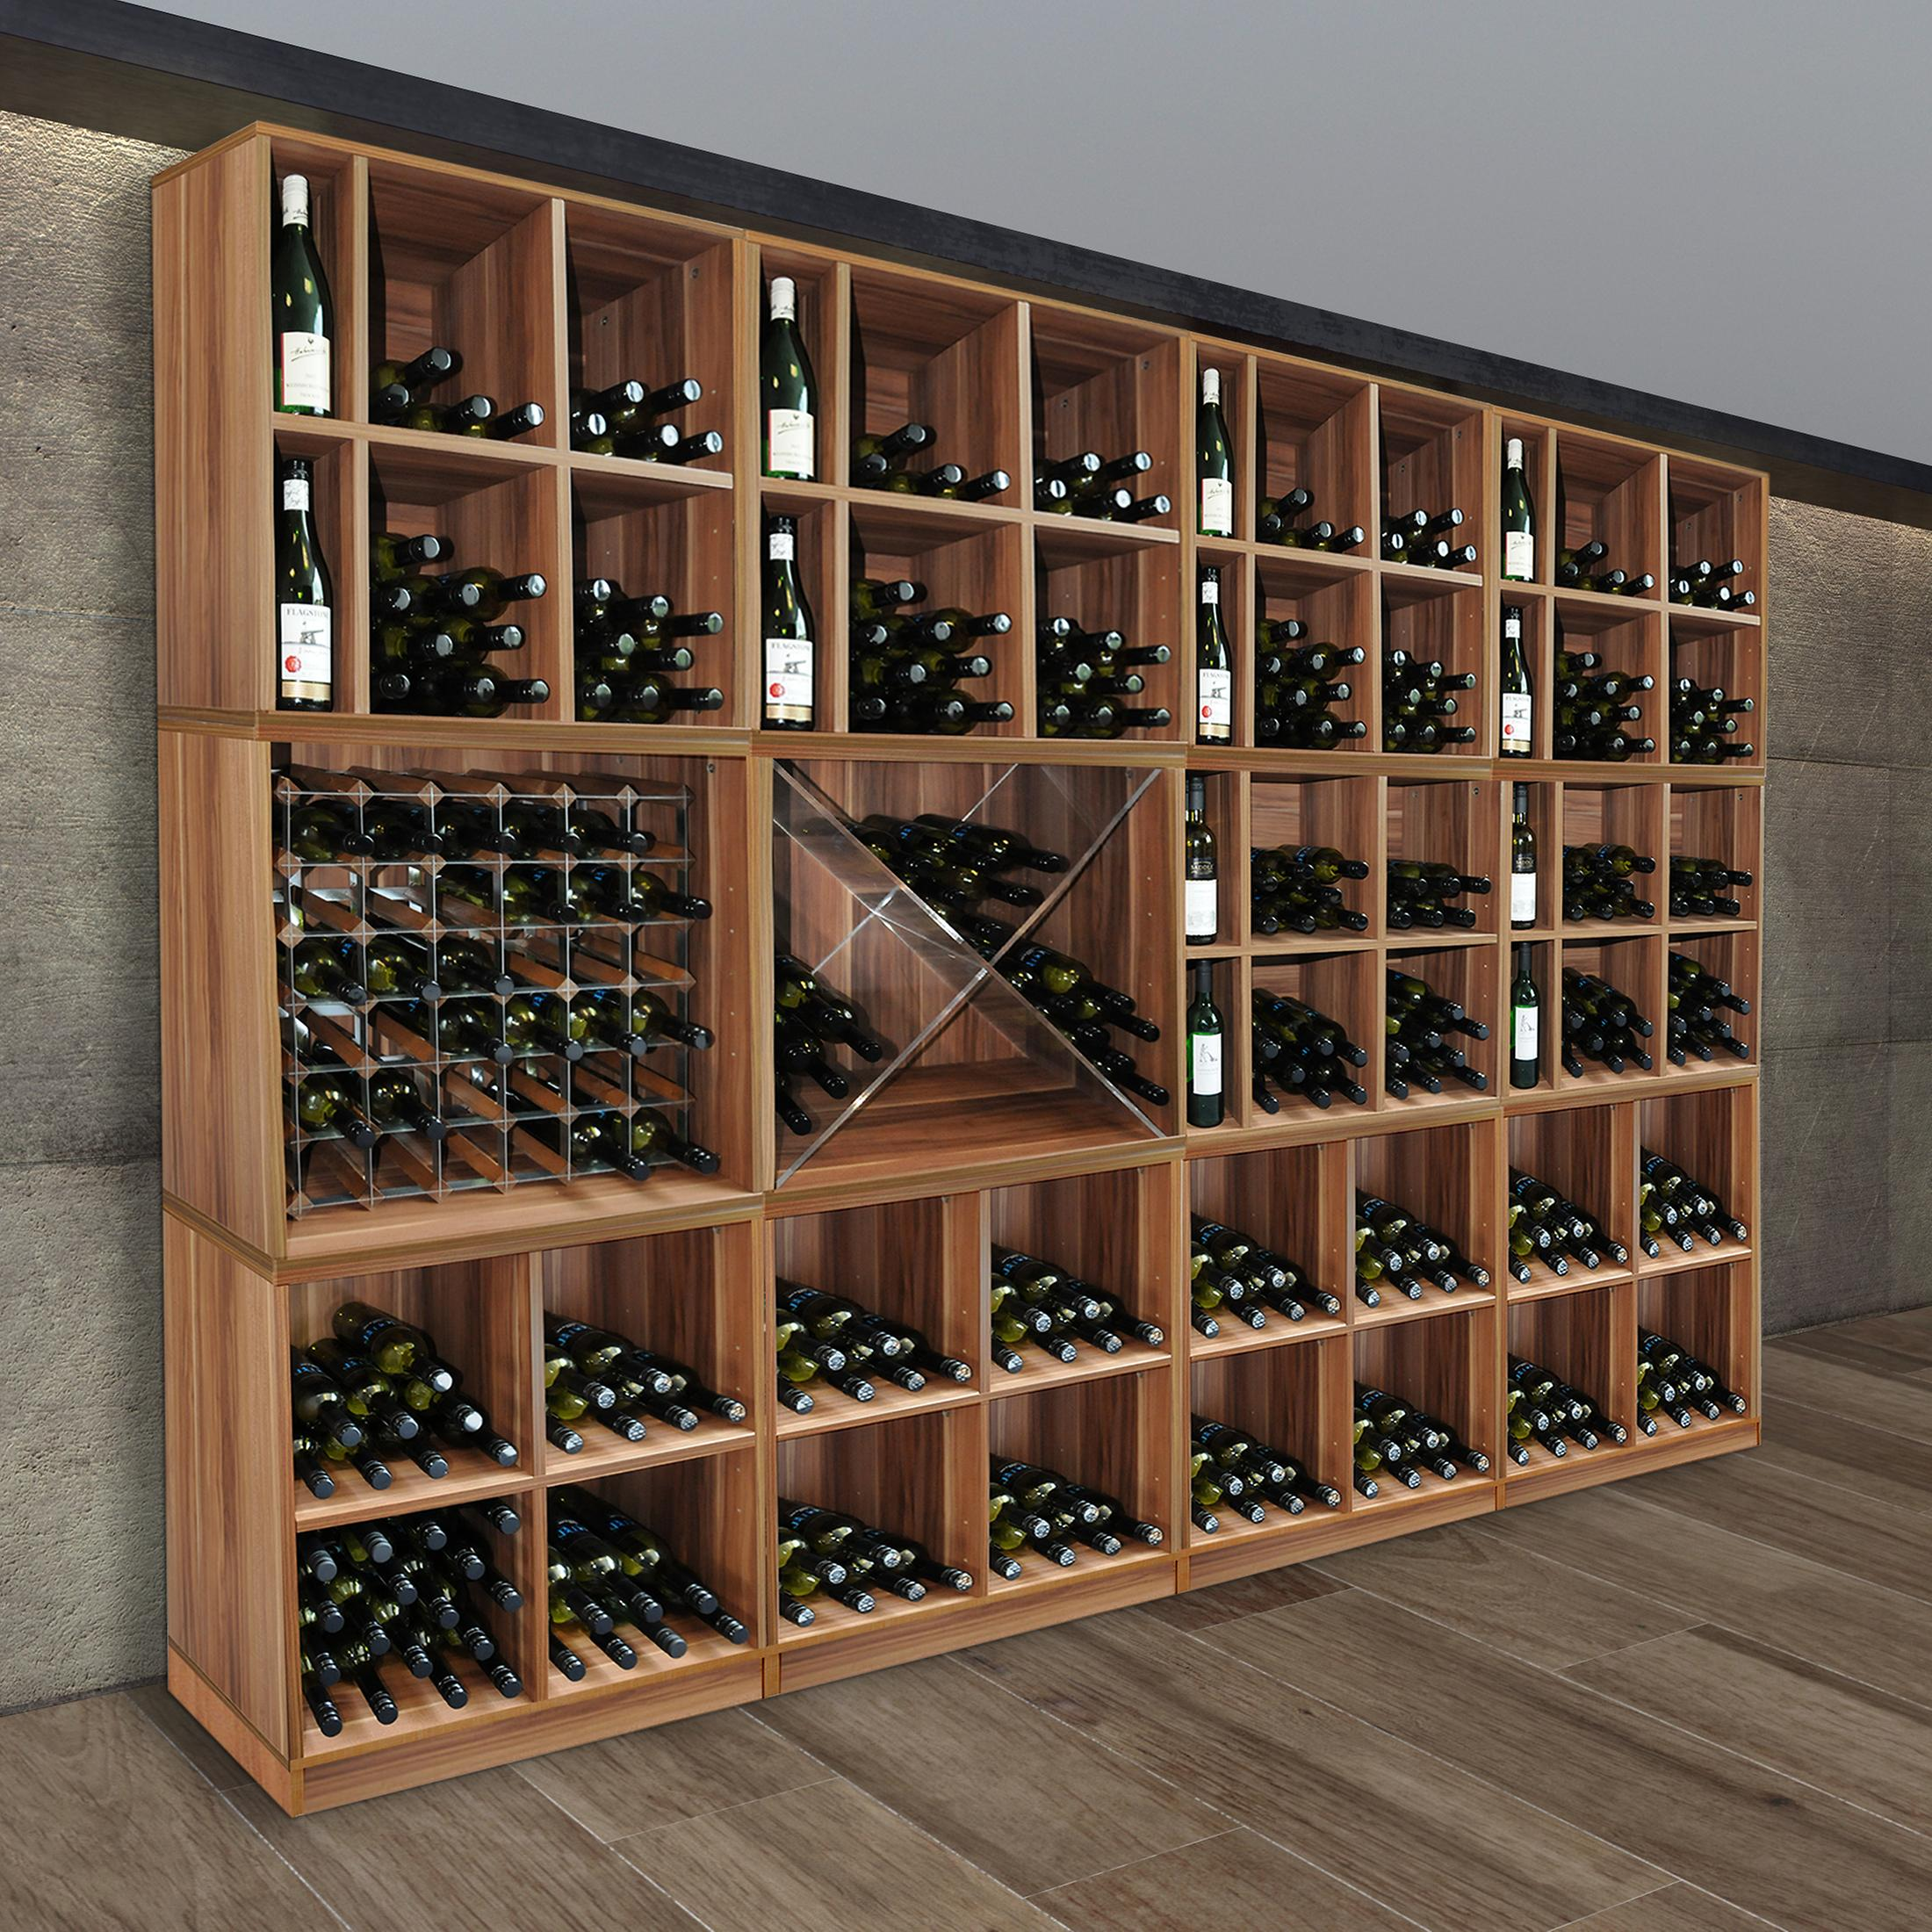 weinregal flaschenregal system cavepro holz melamin beschichtet birnbaum ebay. Black Bedroom Furniture Sets. Home Design Ideas